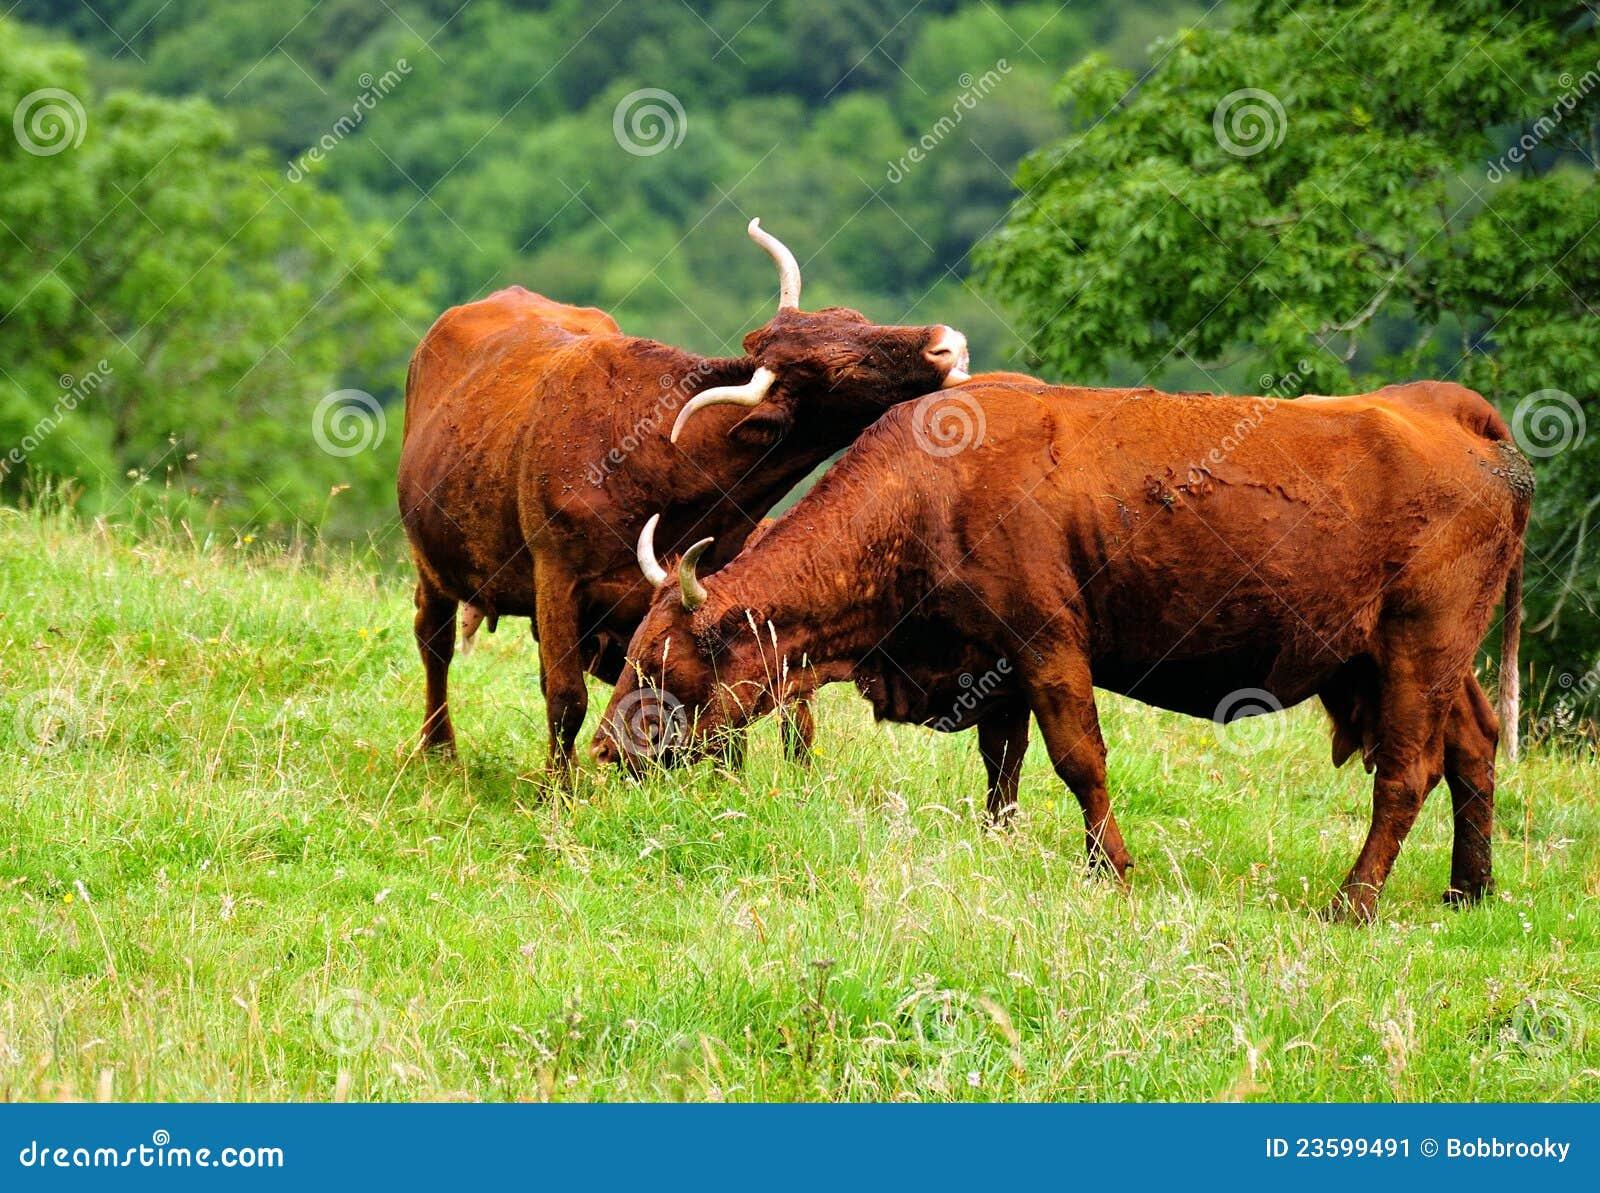 Salers Cattle, Jura Region, France Stock Image - Image ...